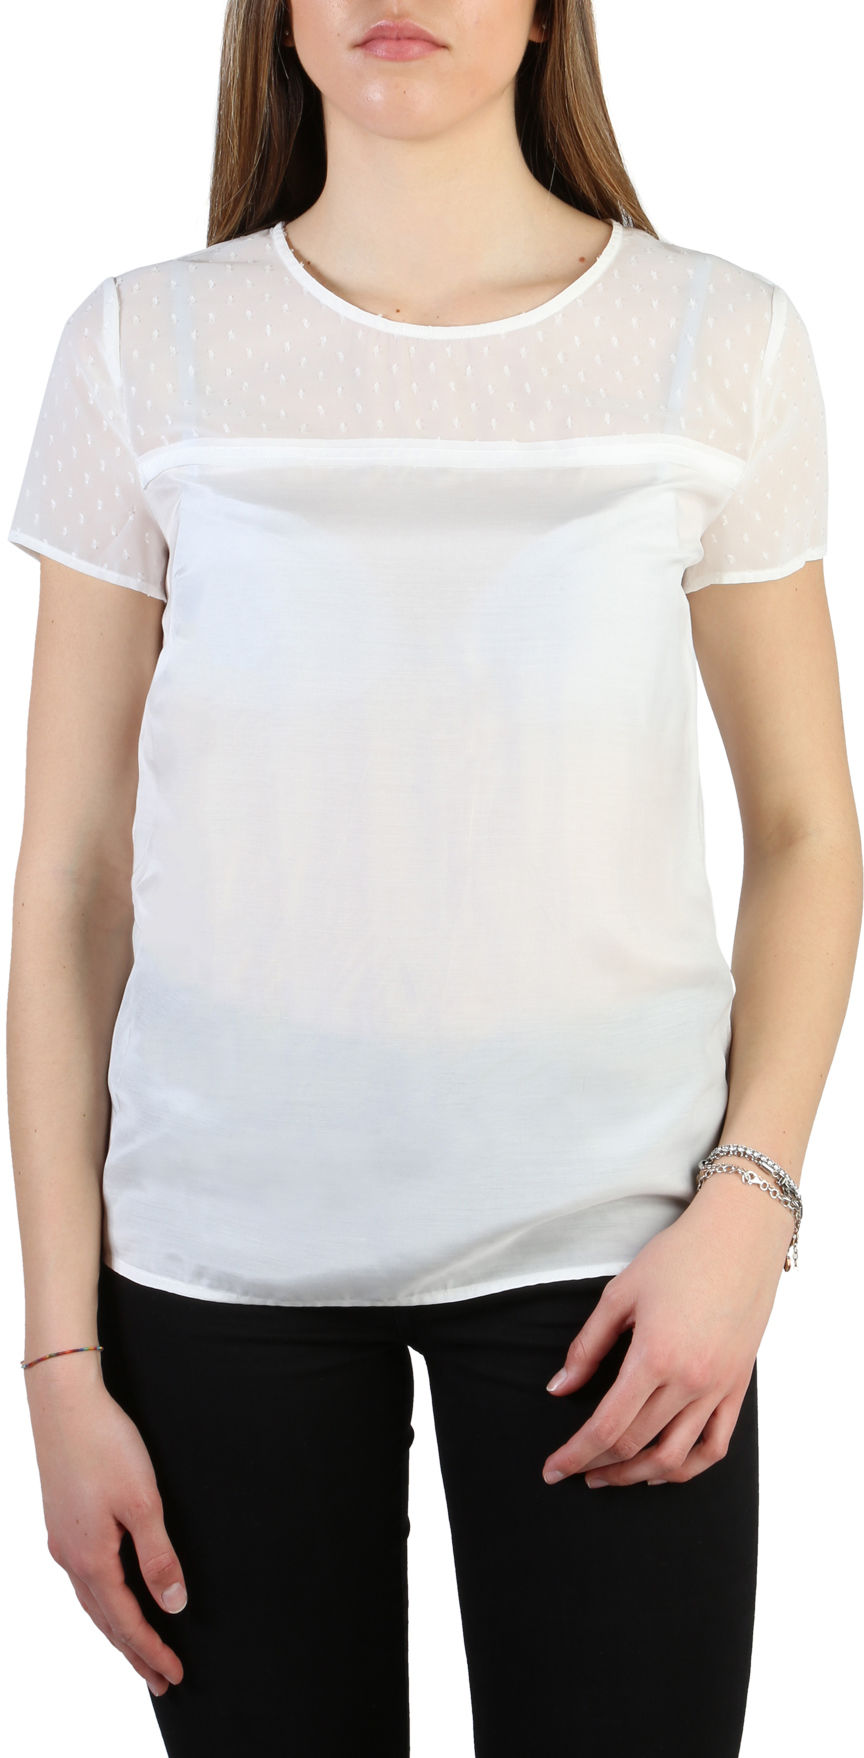 Koszulki Armani Jeans Damskie